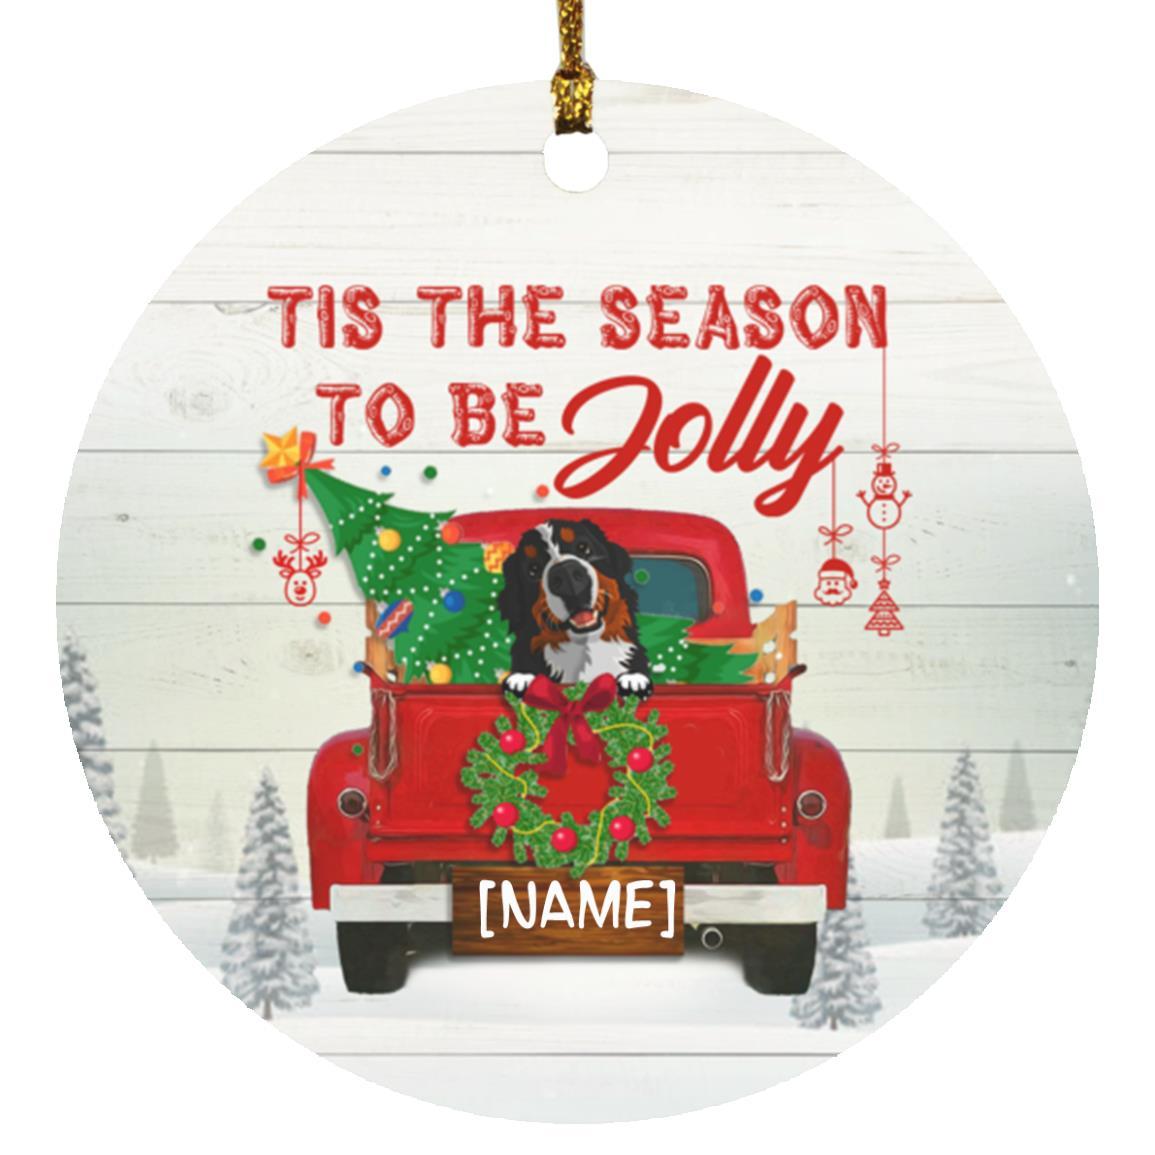 Xmas Dog Lover Gift 2020 Quarantine Christmas Gift For Dog Mom Ornament Personalized Christmas Girl With Dog Ornament Christmas Ornament